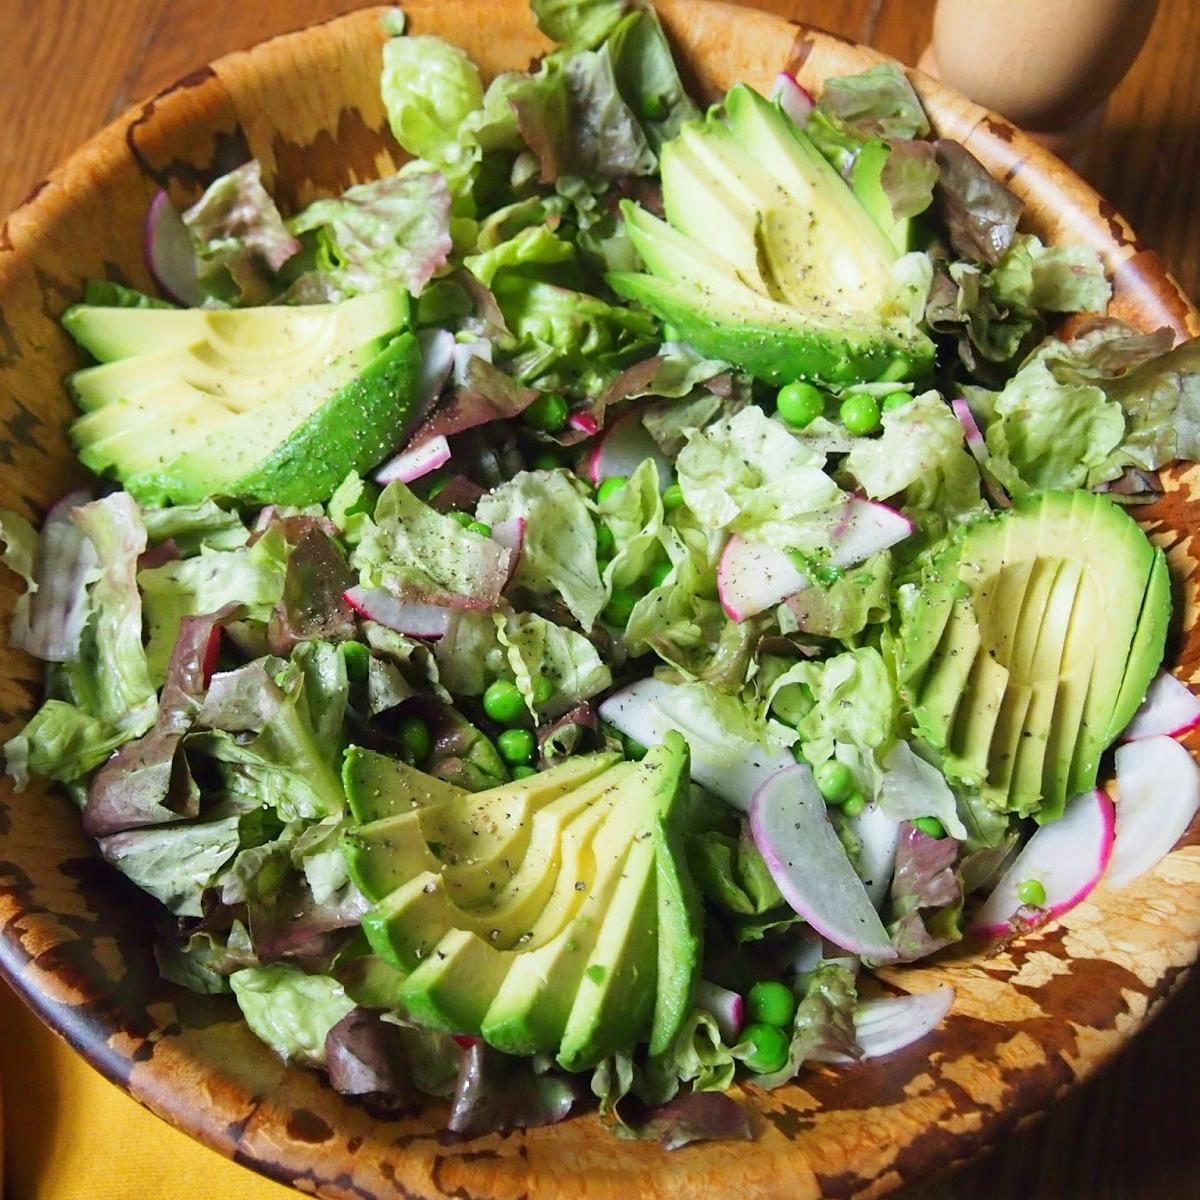 Spring Salad with Avocado, Radish and Lemon-Mint Dressing